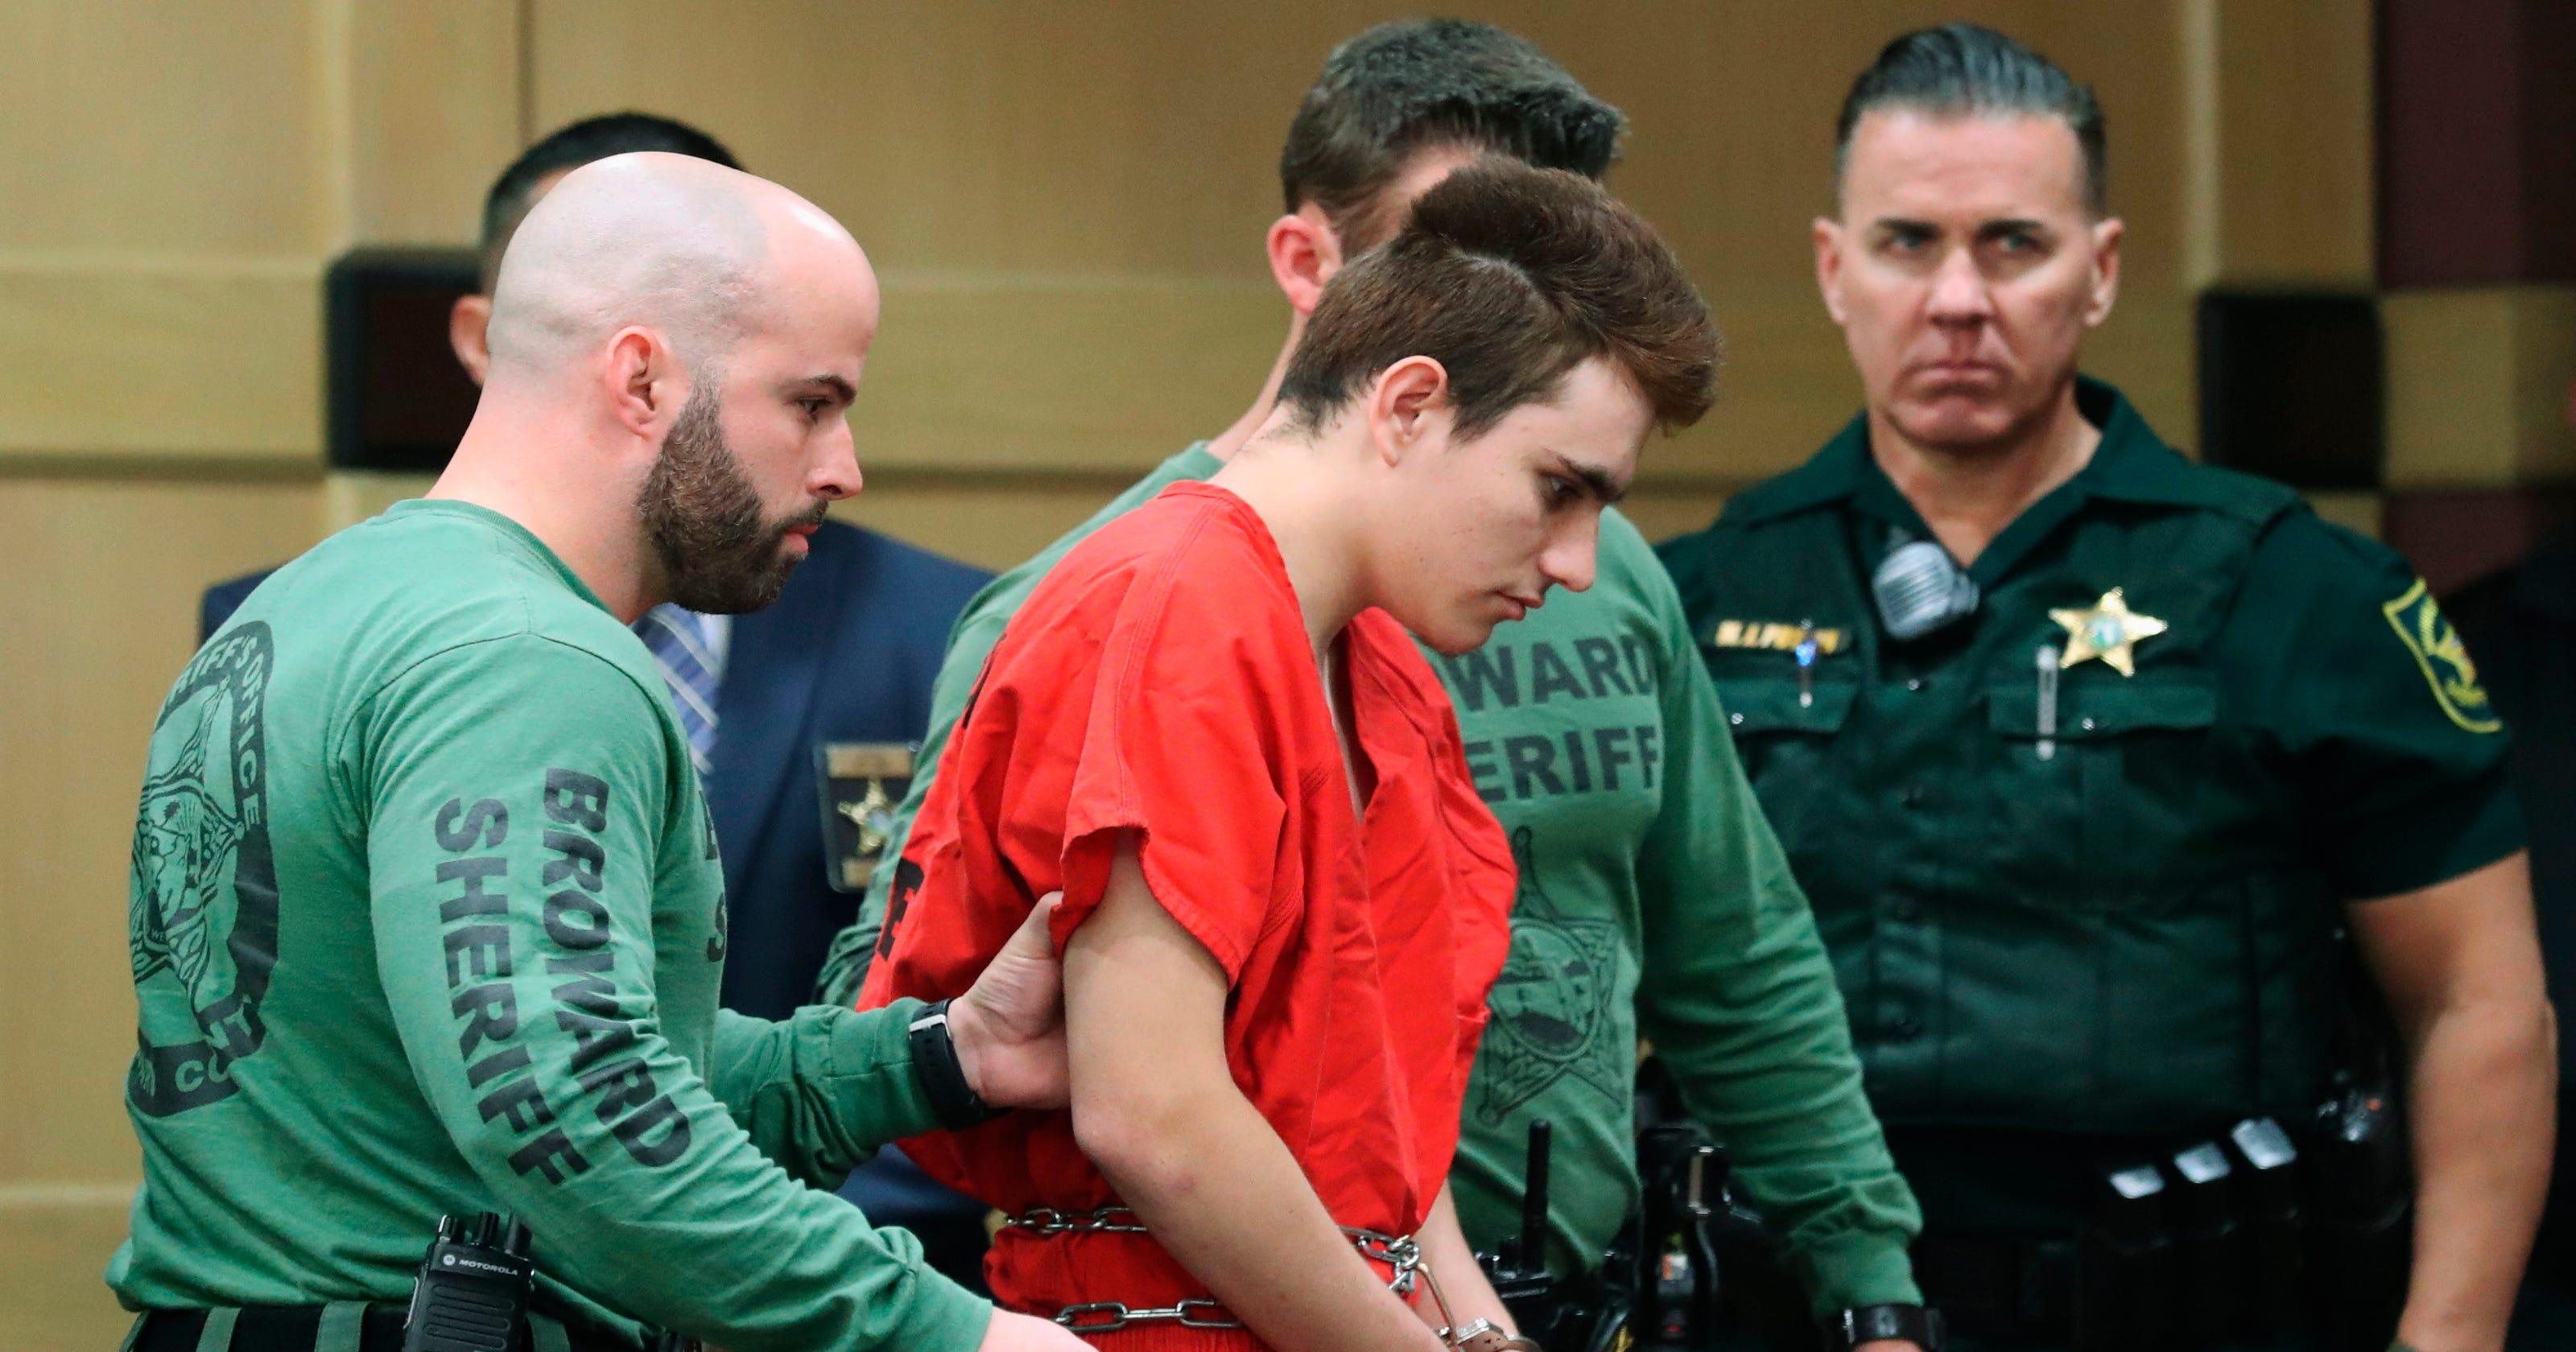 Timeline: Case against Nikolas Cruz in Florida mass school shooting